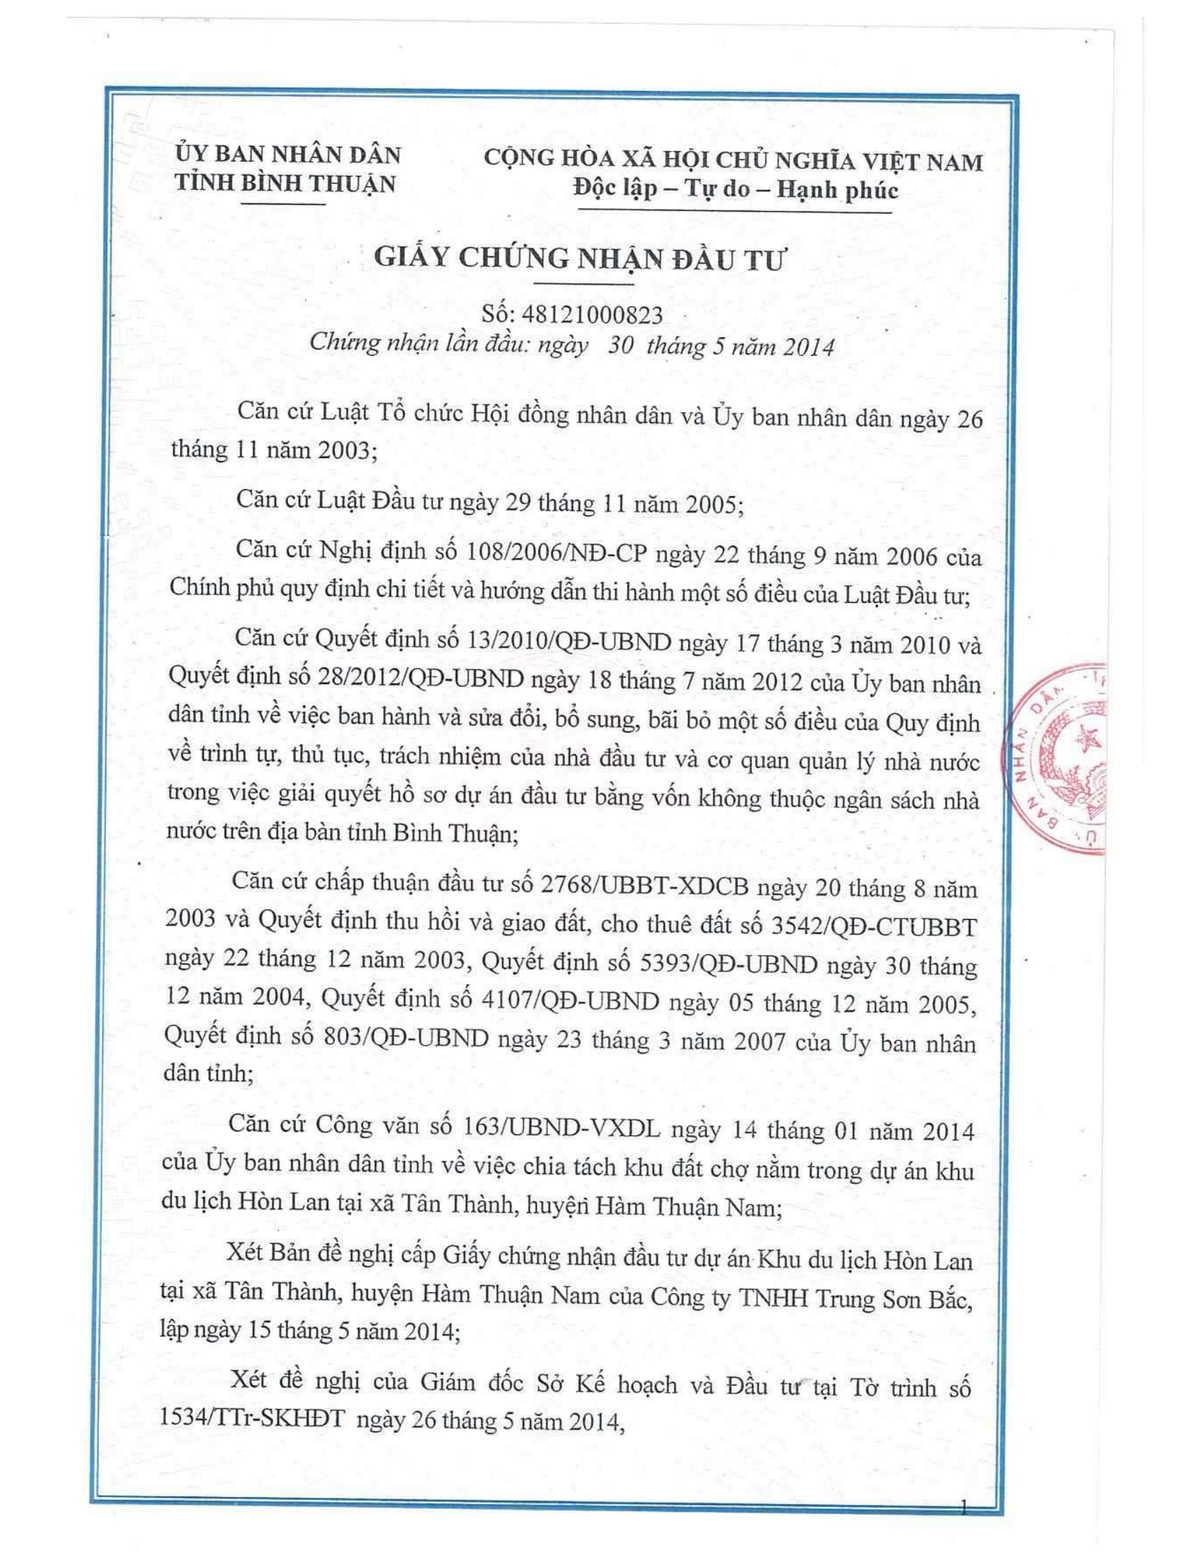 Giay chung nhan dau tu Thanh Long Bay